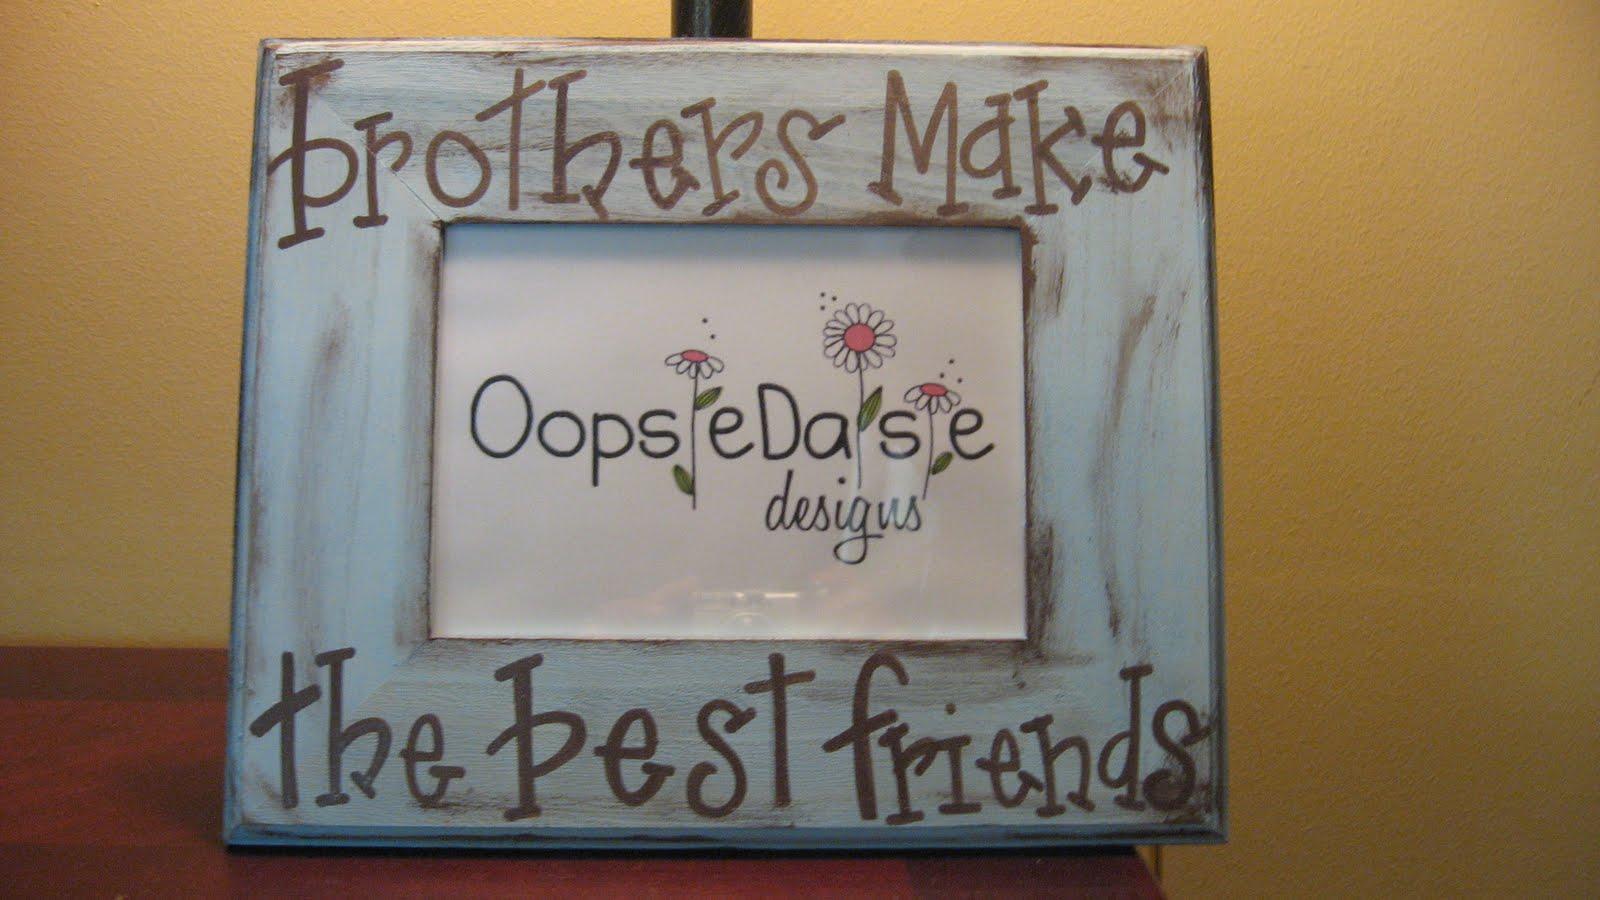 Oopsie Daisie Designs: brothers make the best friends